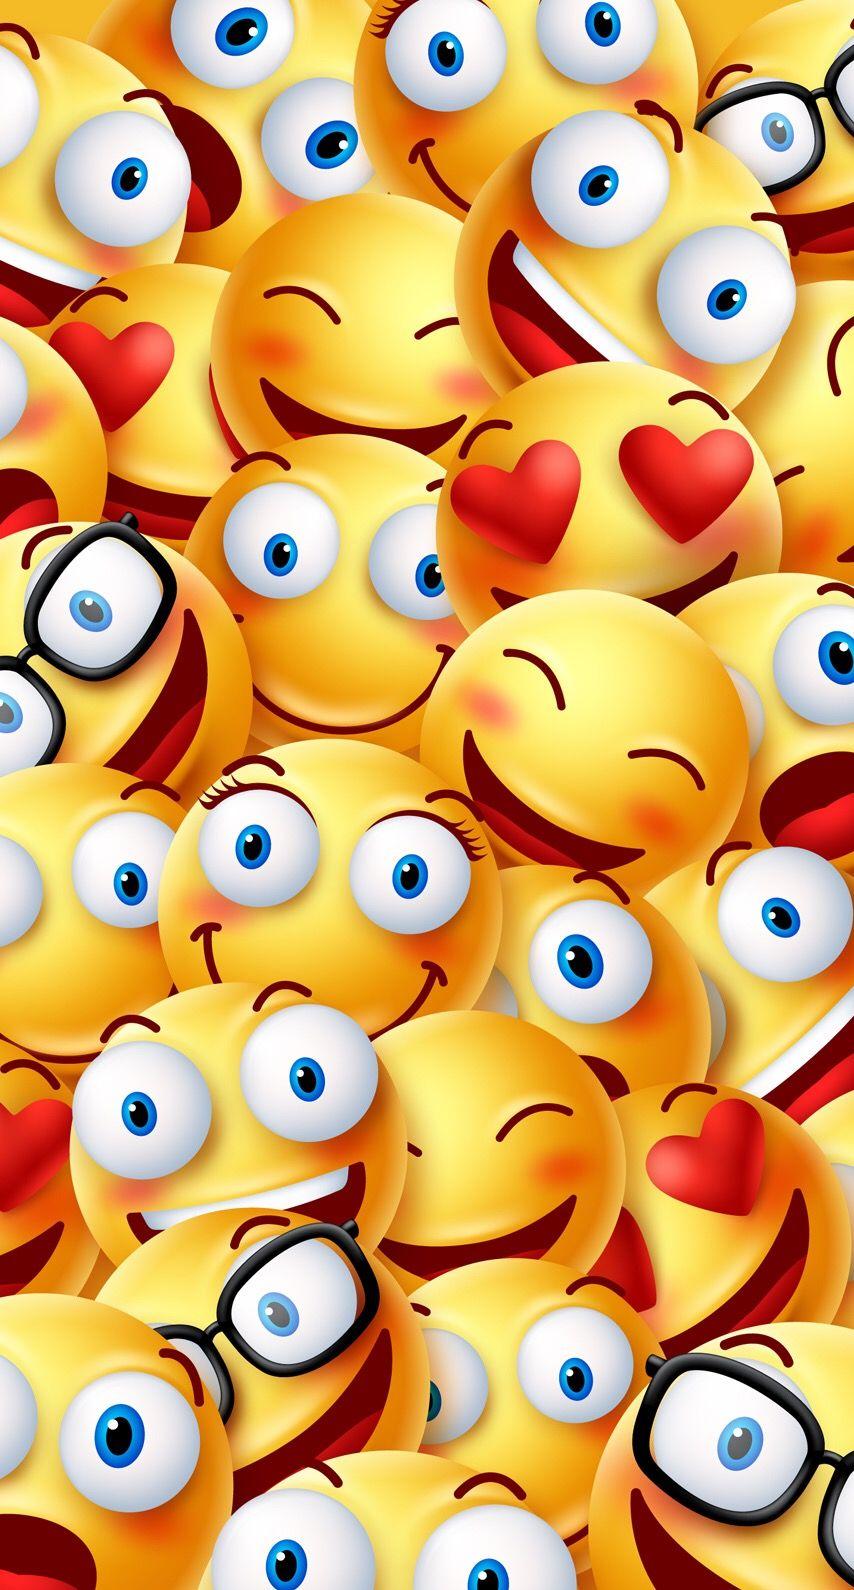 Emoji iPhone 6 | #Fondos de pantalla | Pinterest | Emoji ...